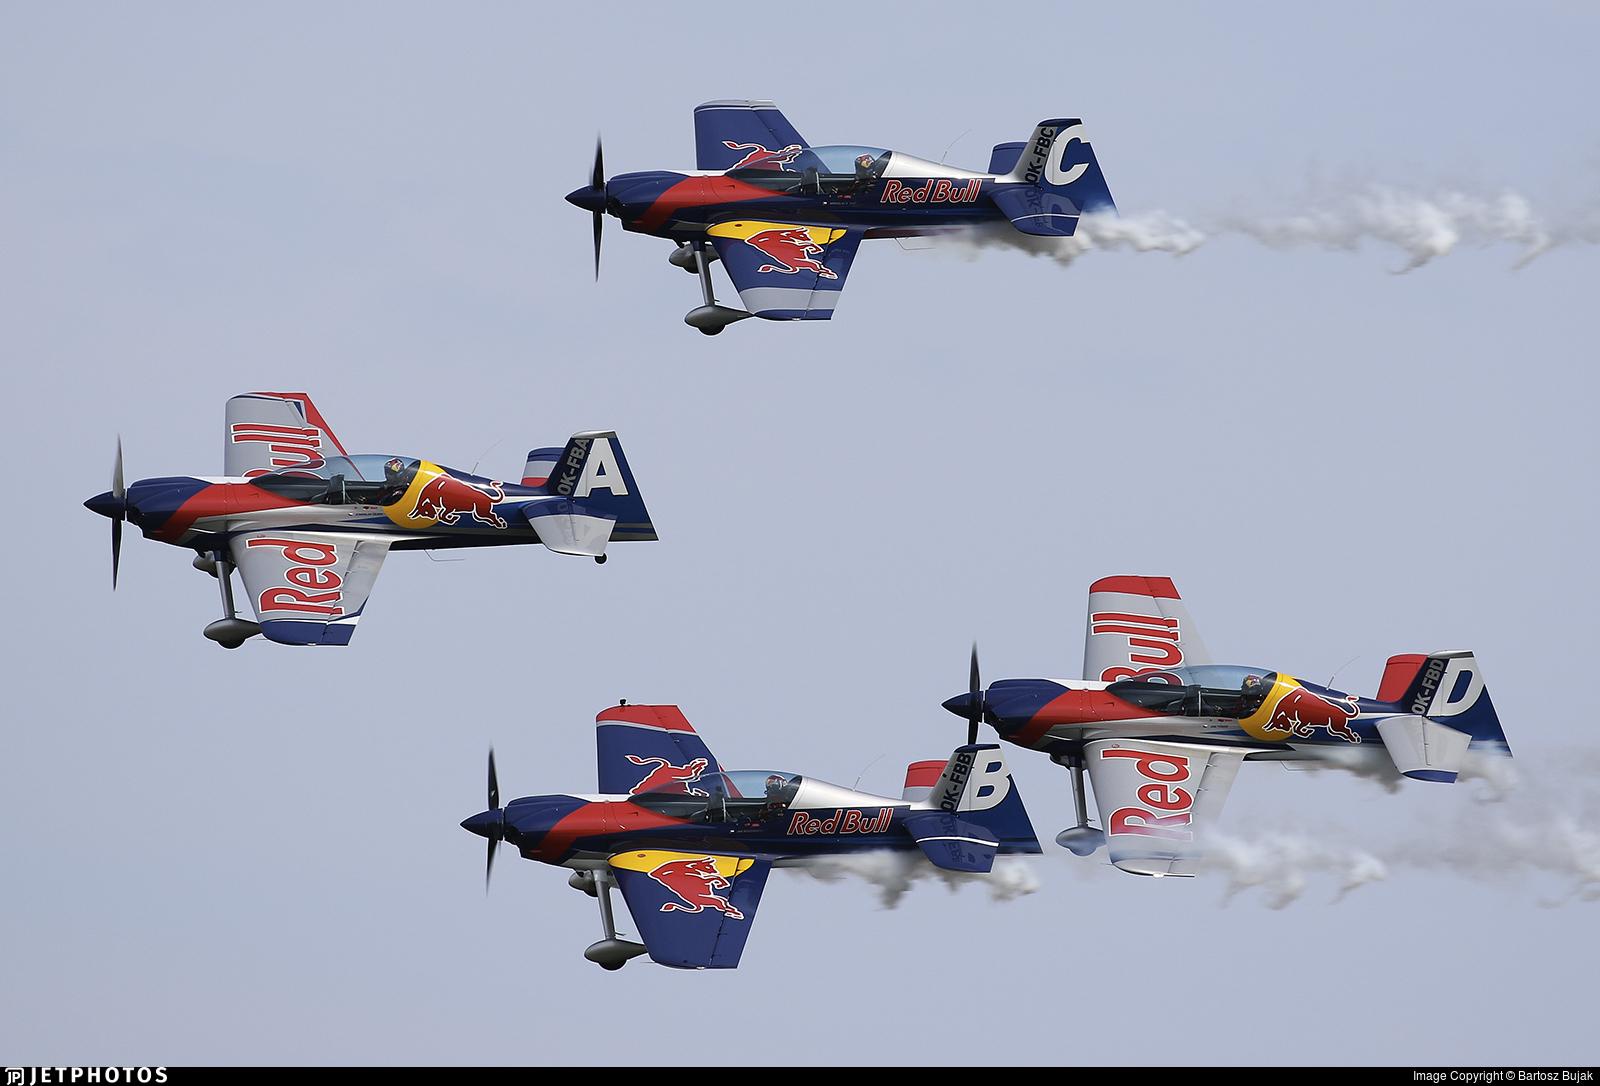 OK-FBD - XtremeAir XA-42 - The Flying Bulls